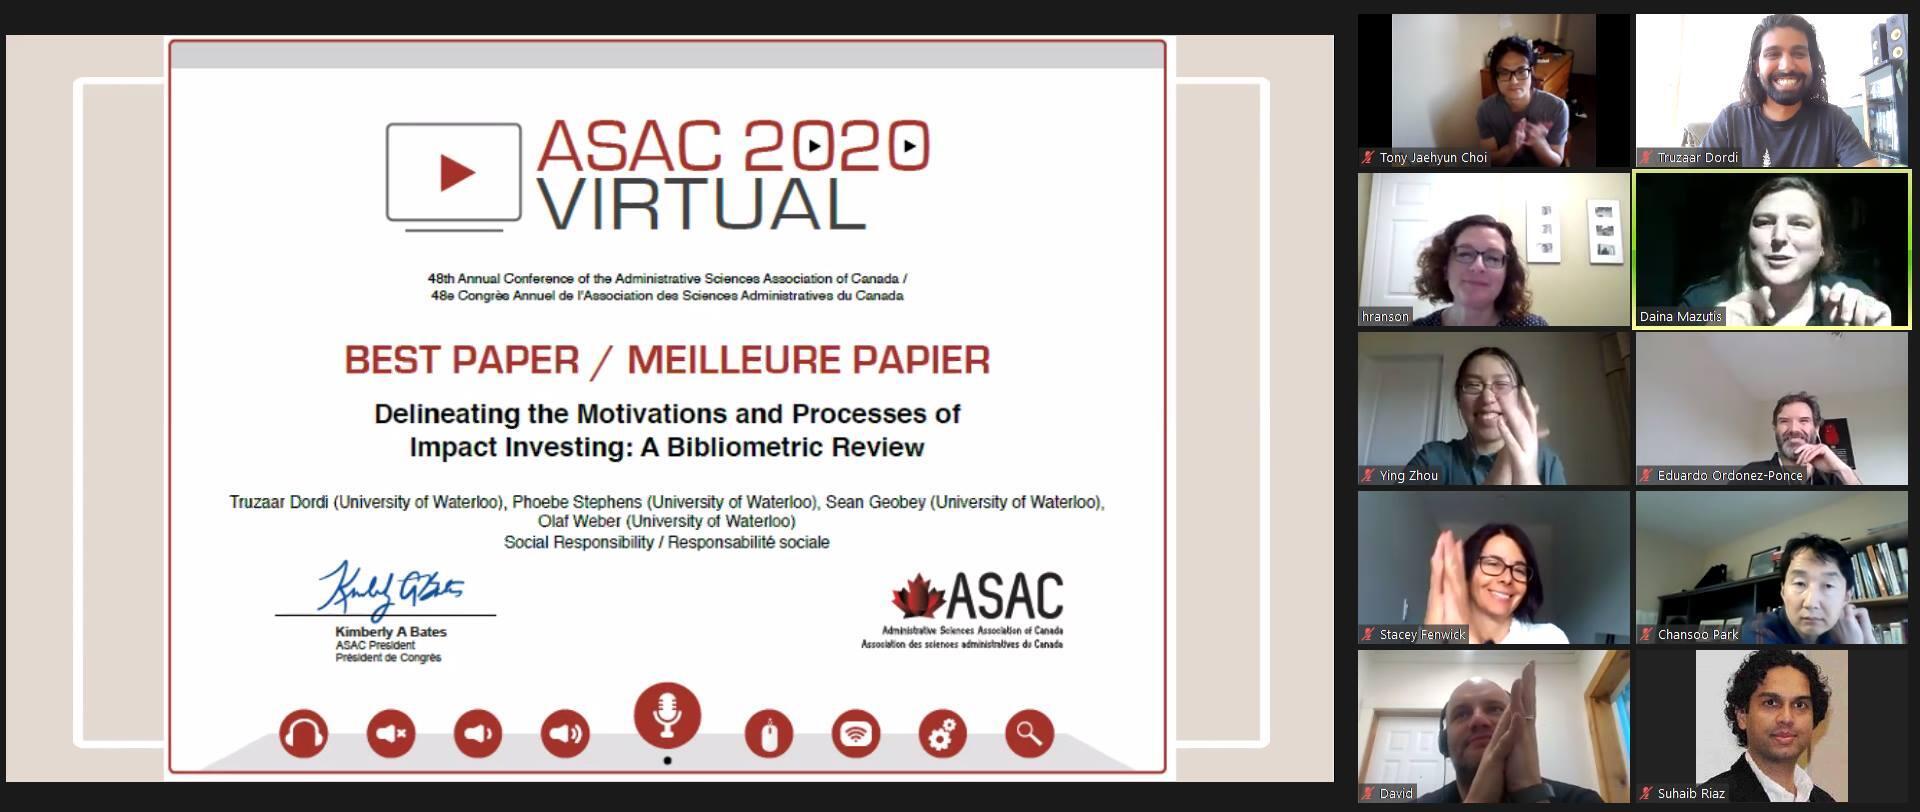 ASAC Best Paper Award Image